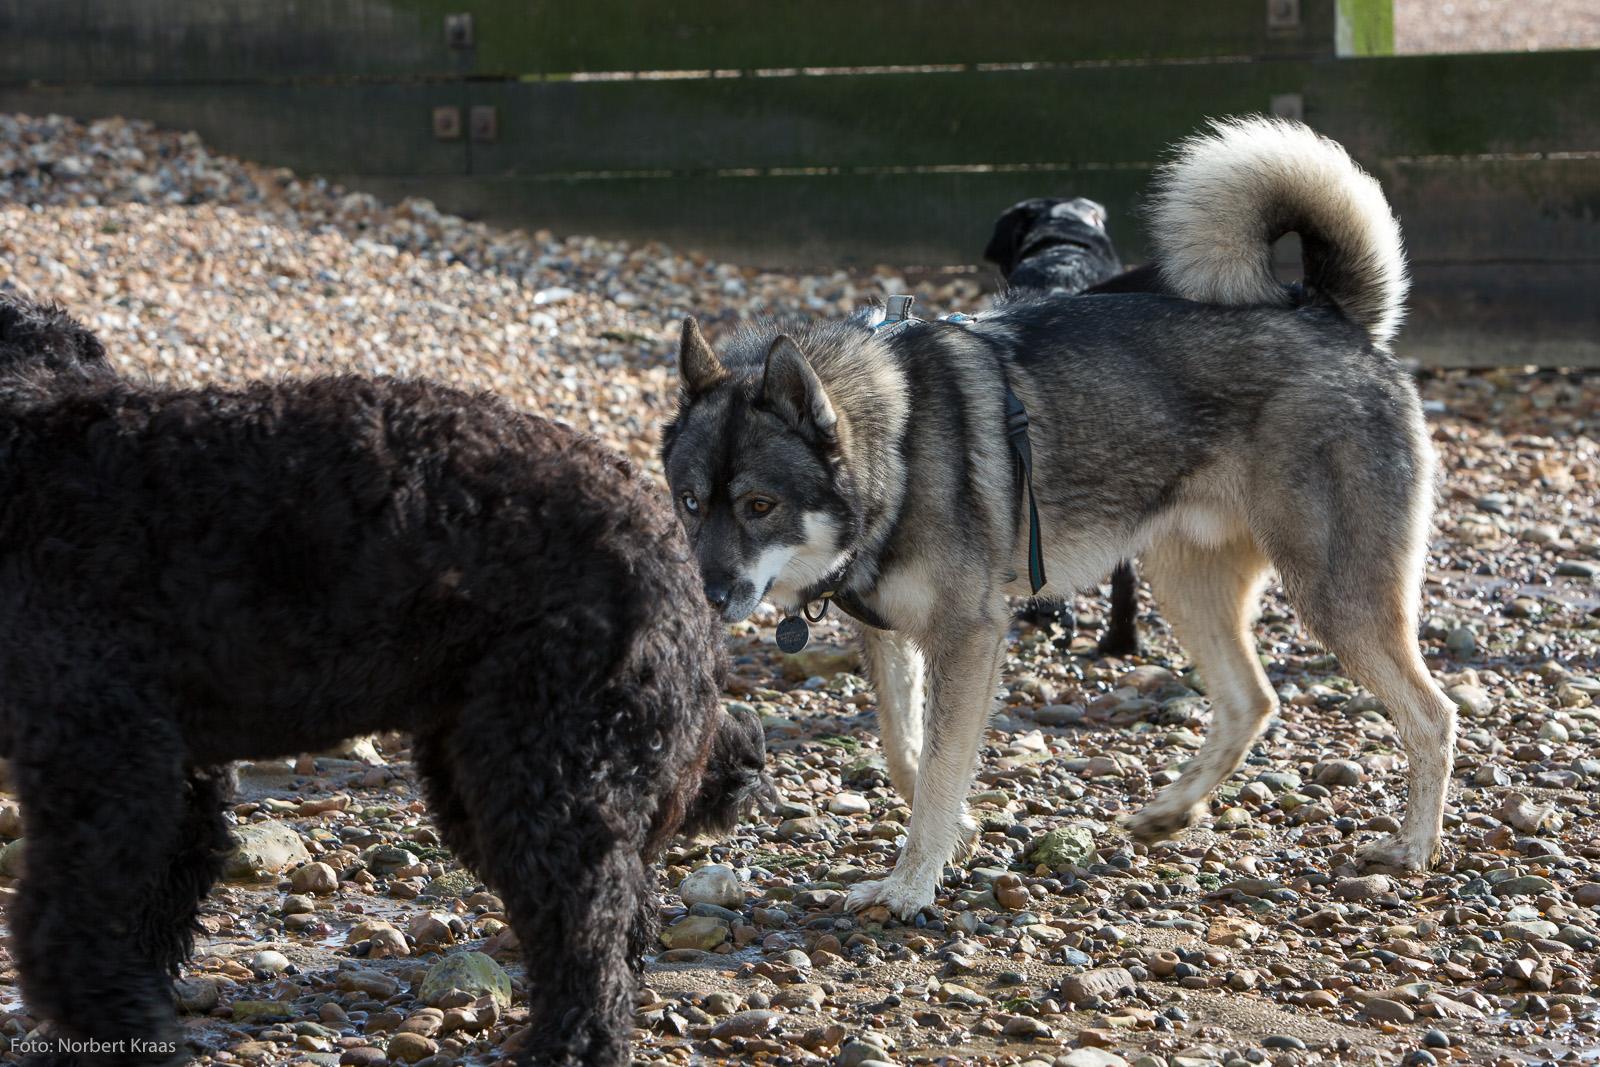 Die mit dem Husky tanzt. 2/5. Foto: Norbert Kraas